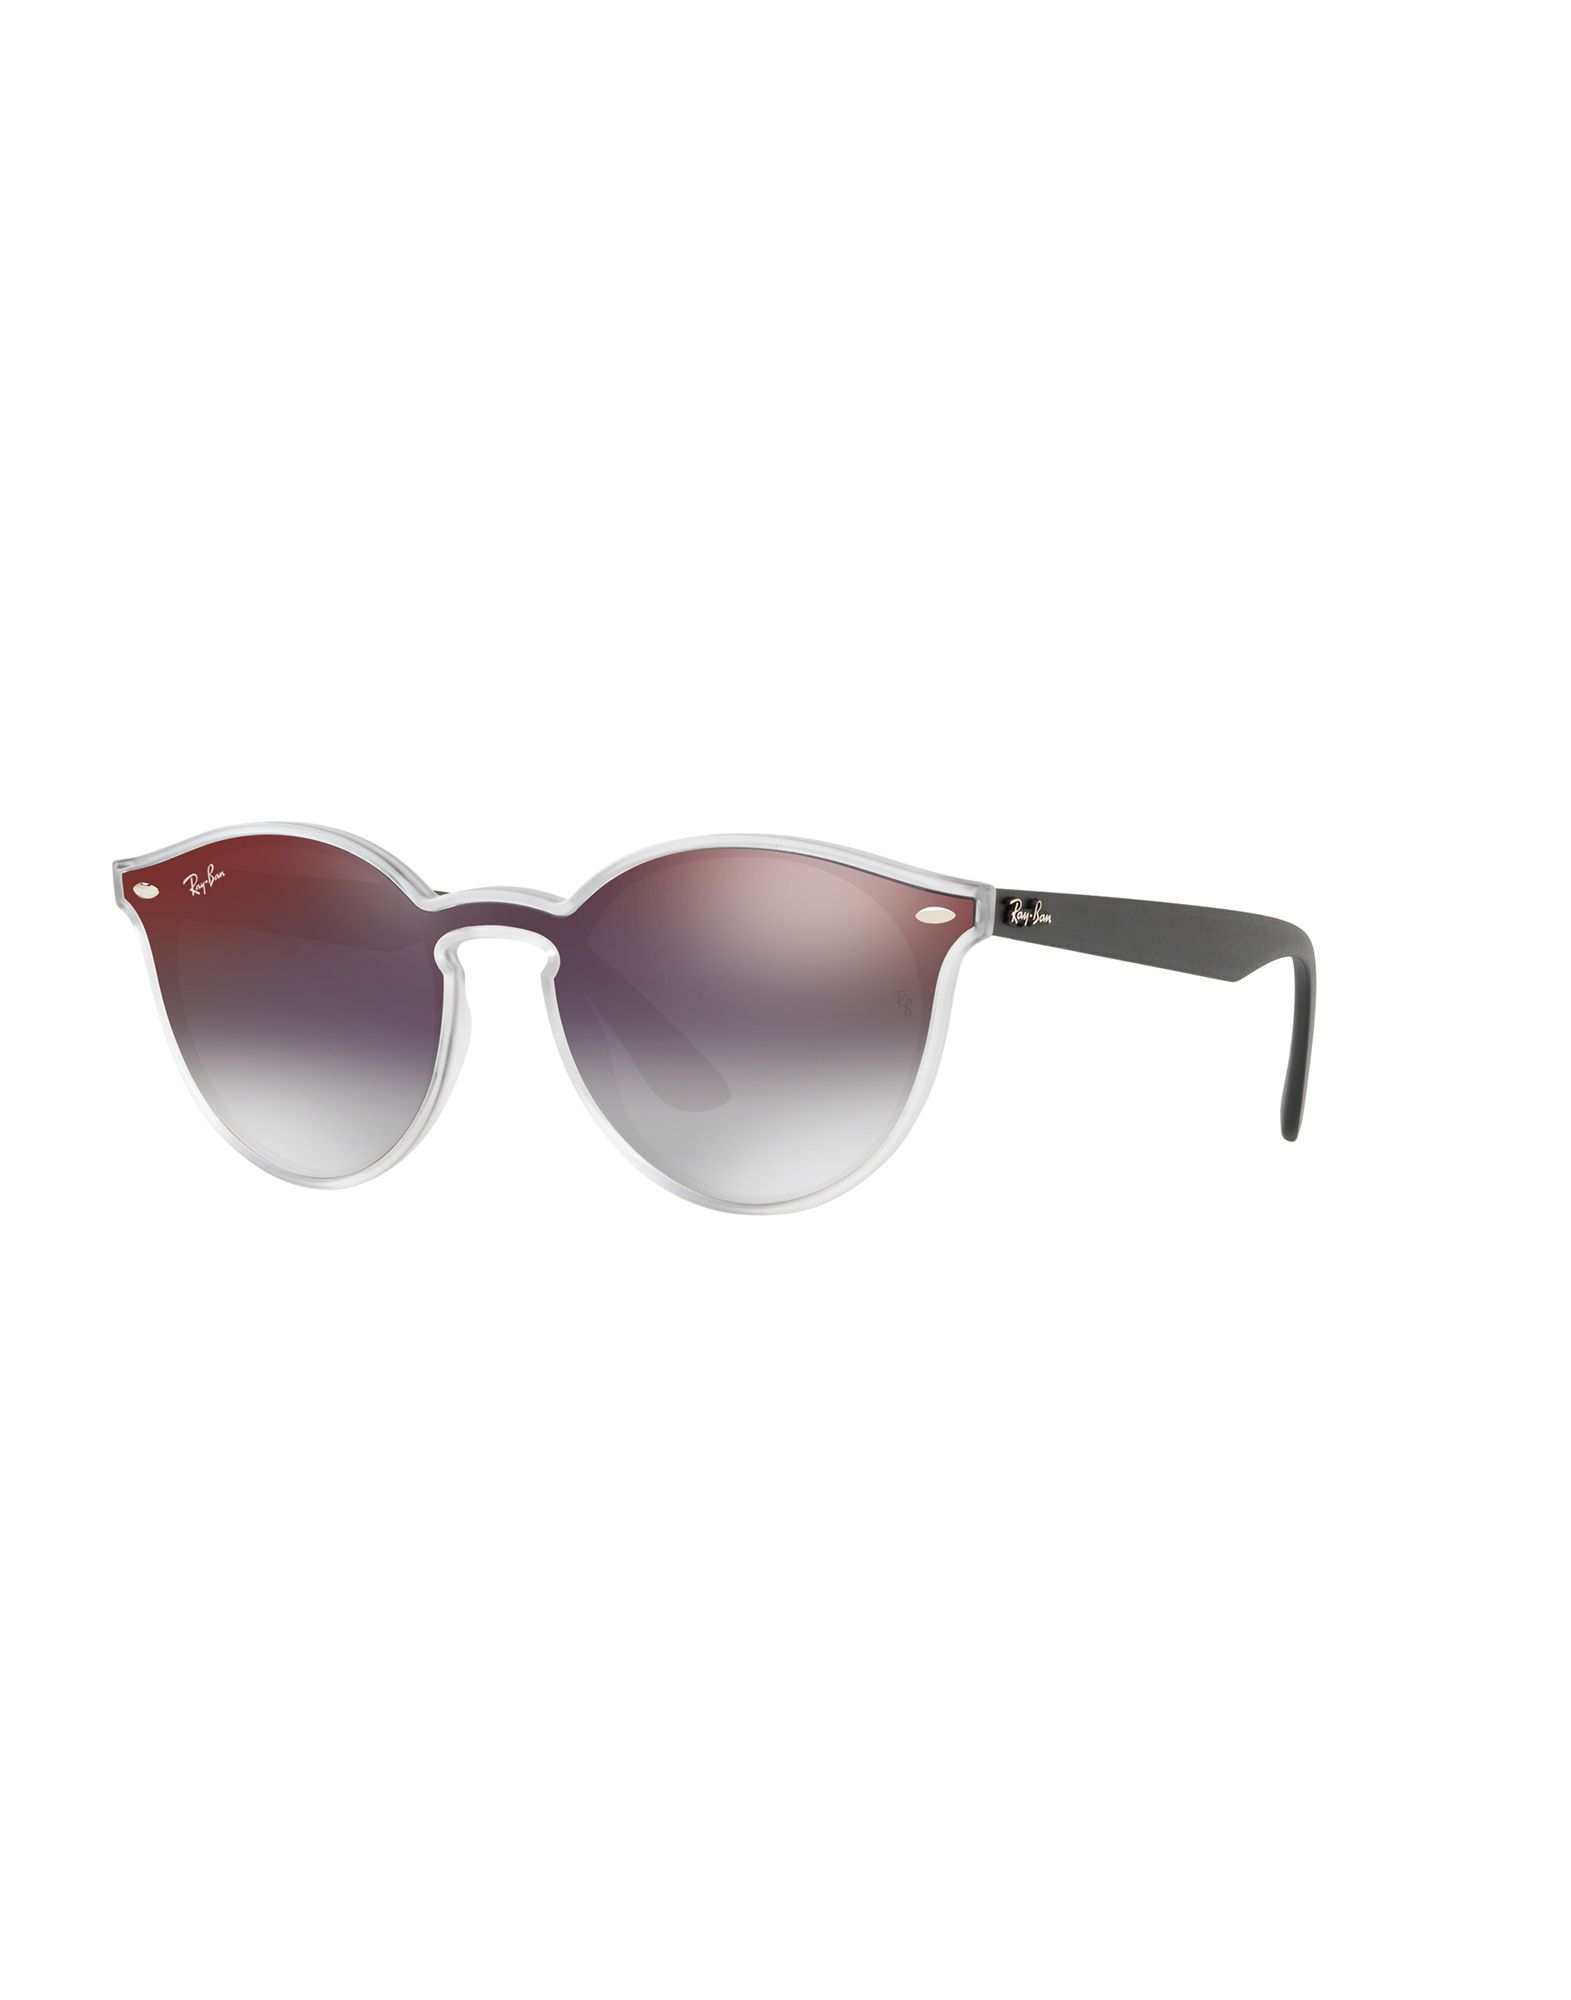 RAY-BAN Солнечные очки ray ban ray ban очки мужчин и женщин серебро серебро кадр поляризованные линзы очки солнцезащитные очки rb3543 003 5j 59мм